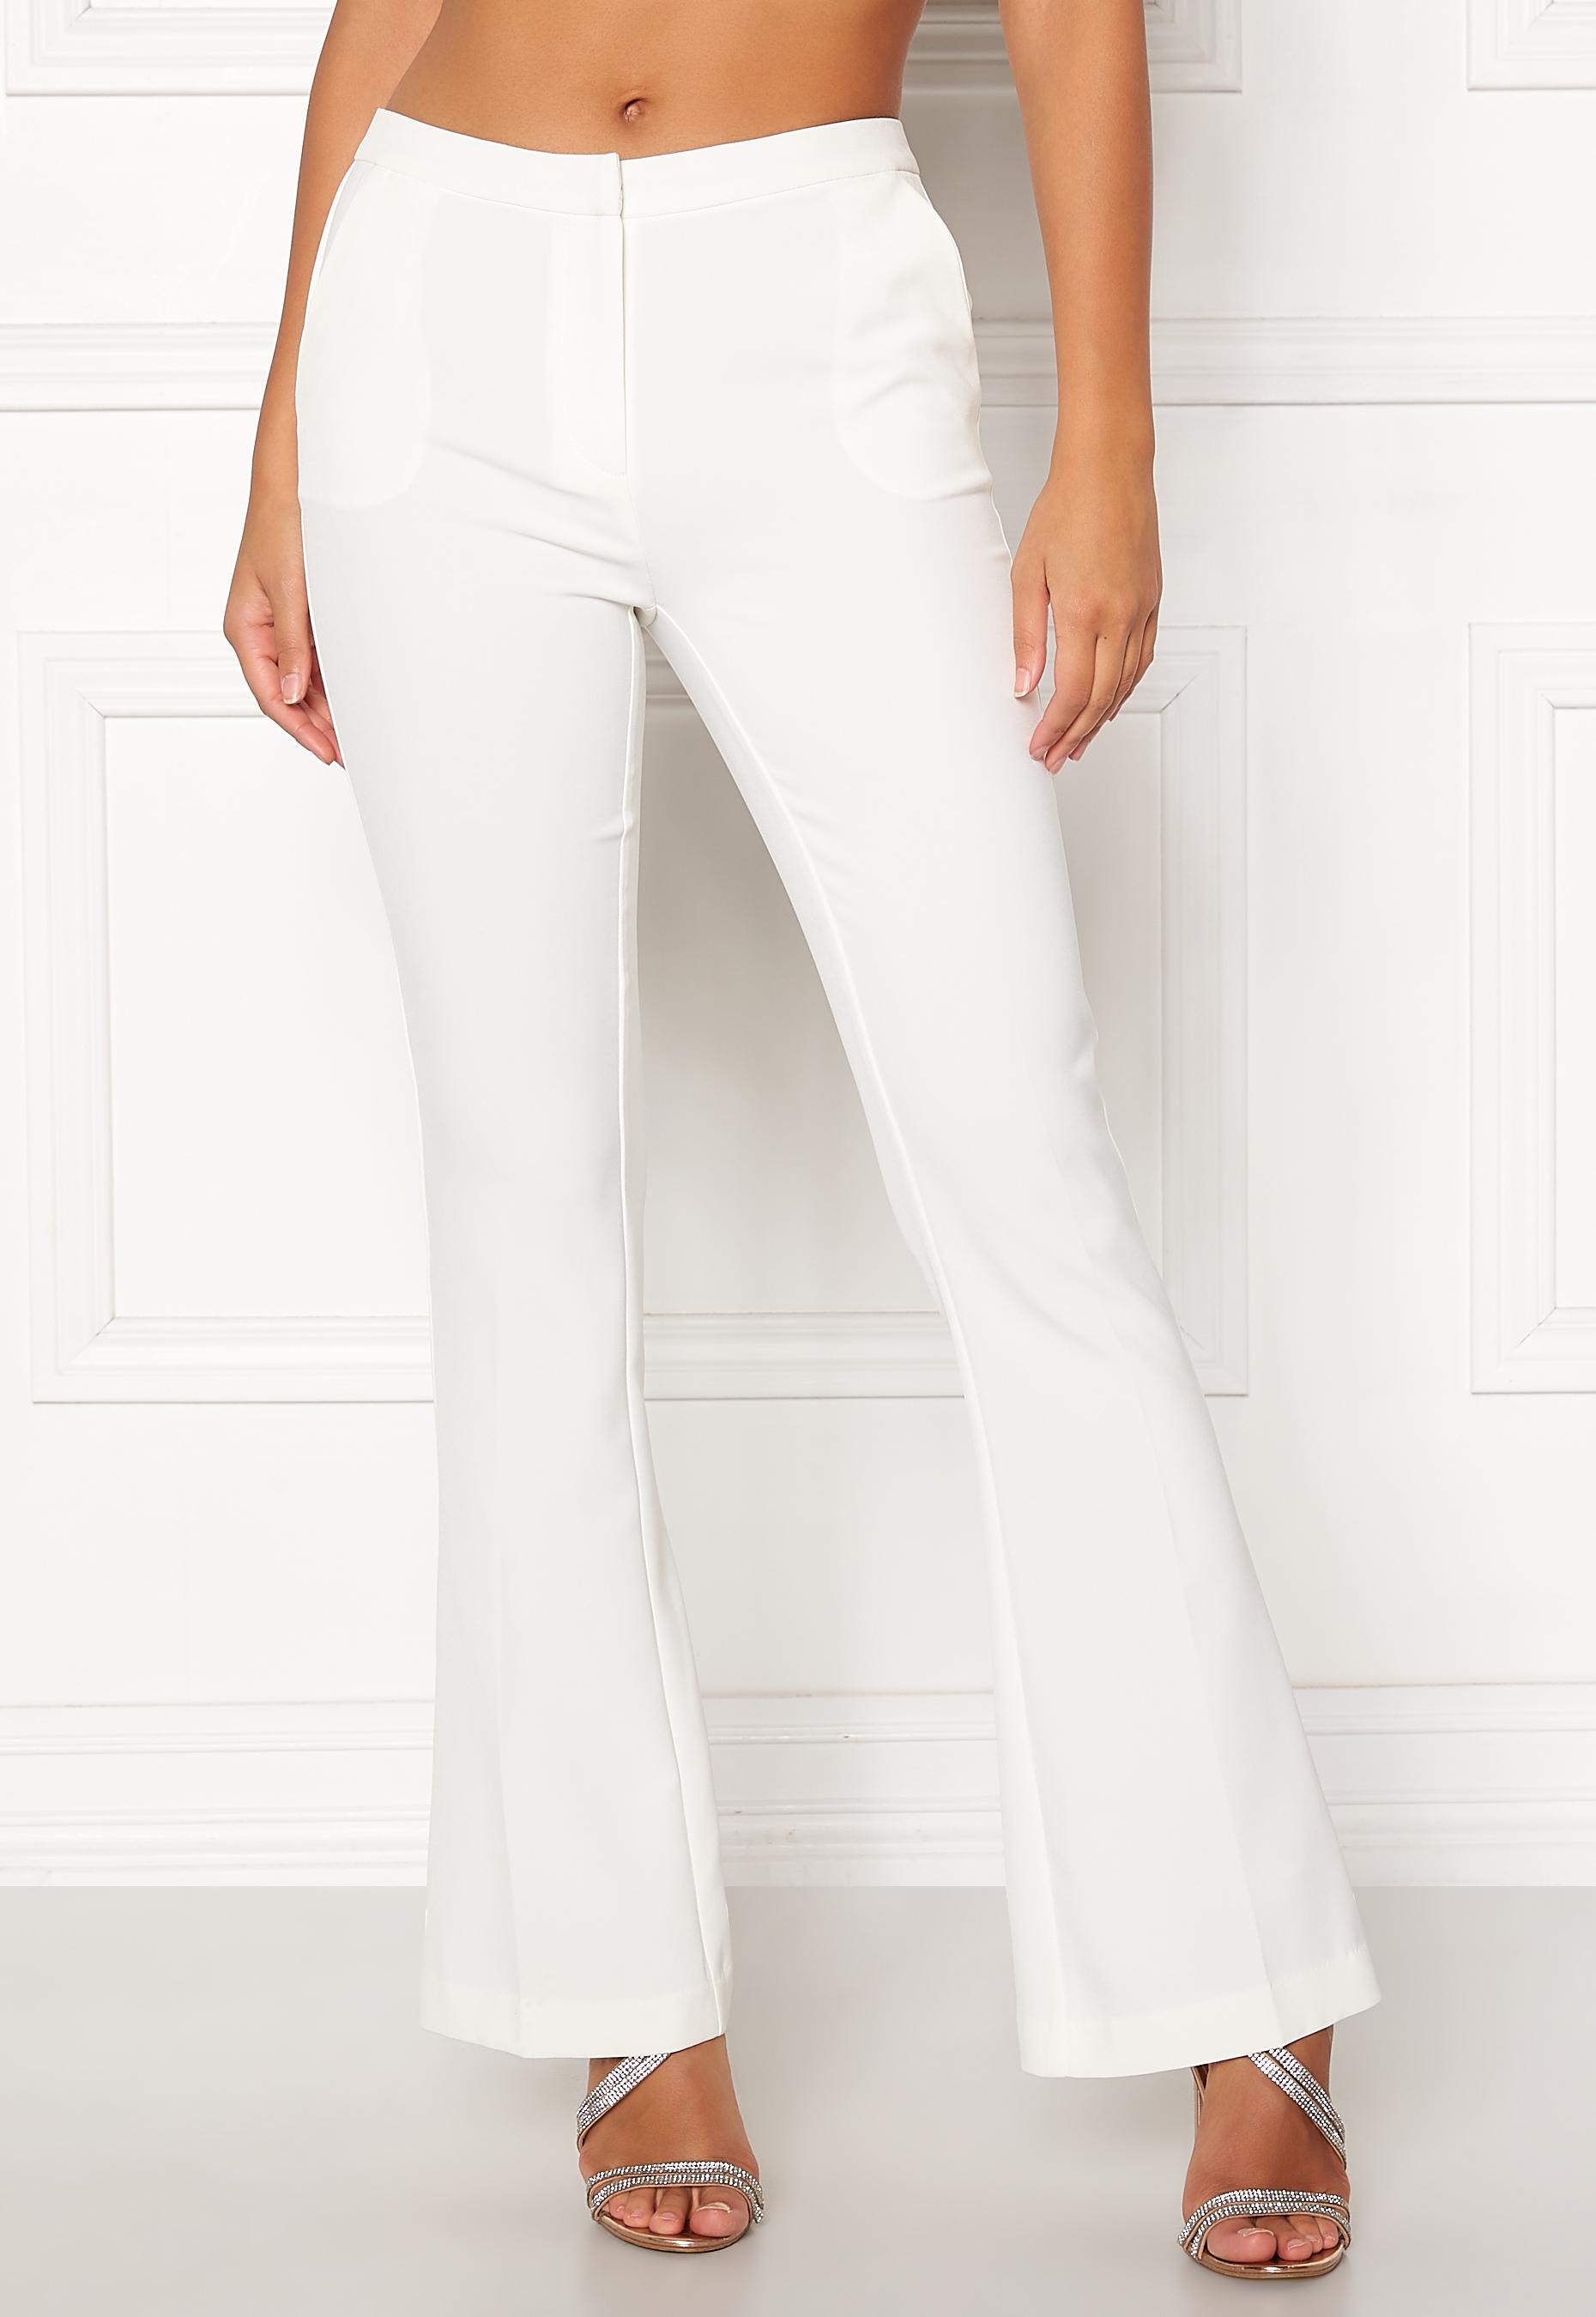 5926a93d8 Y.A.S Samura Libby Pant Star White - Bubbleroom